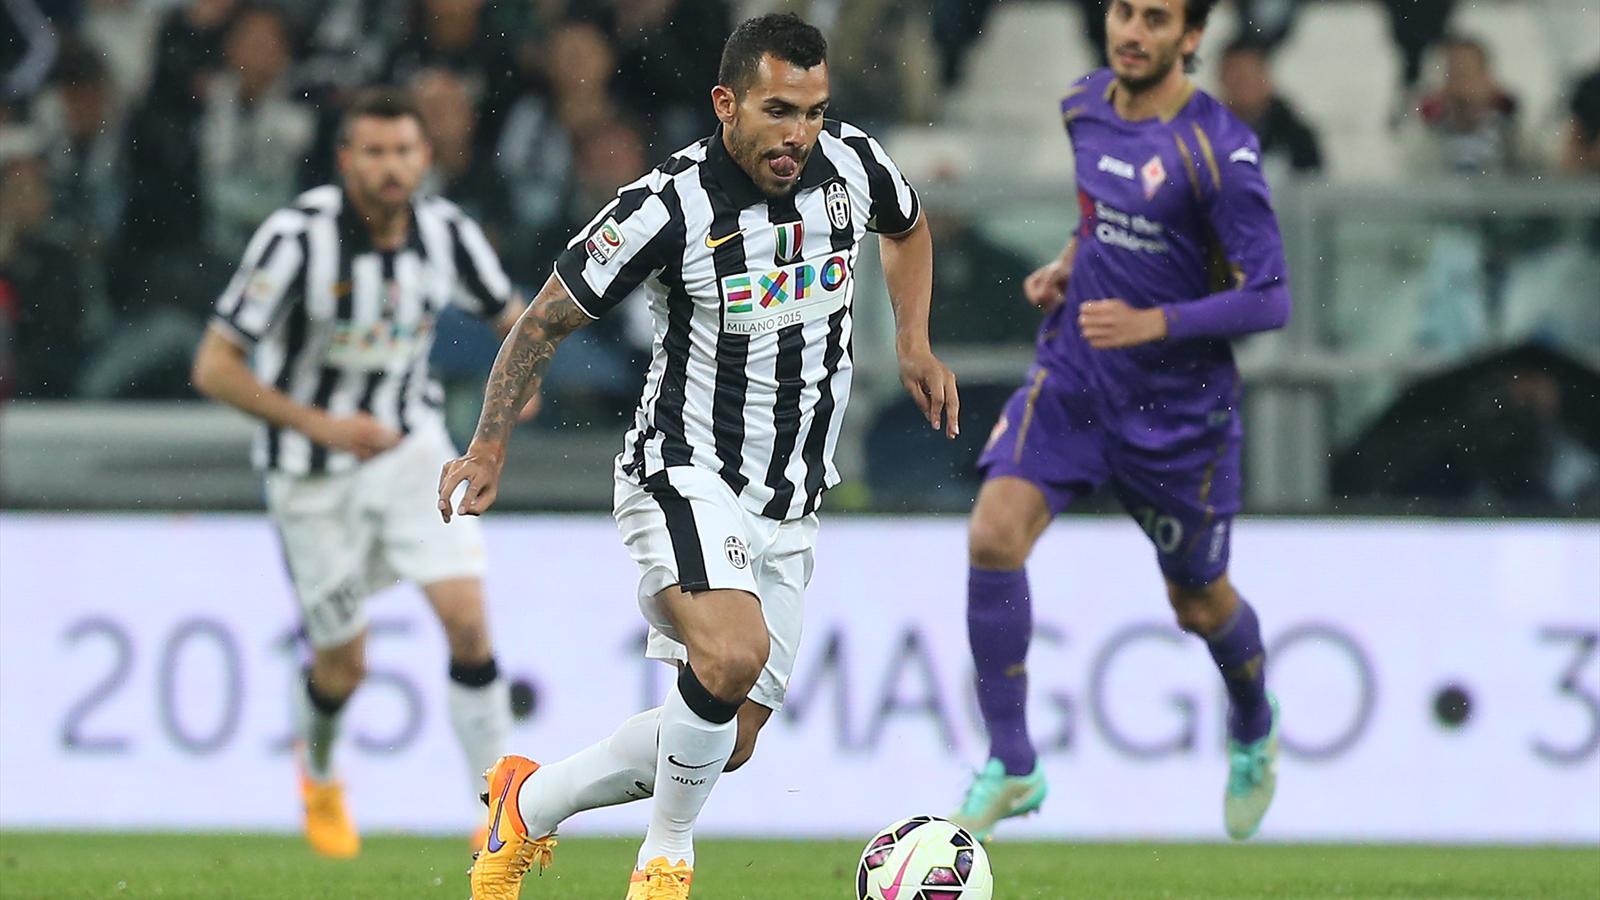 Carlos Tevez (Juventus) face à la Fiorentina - Serie A 2014/2015